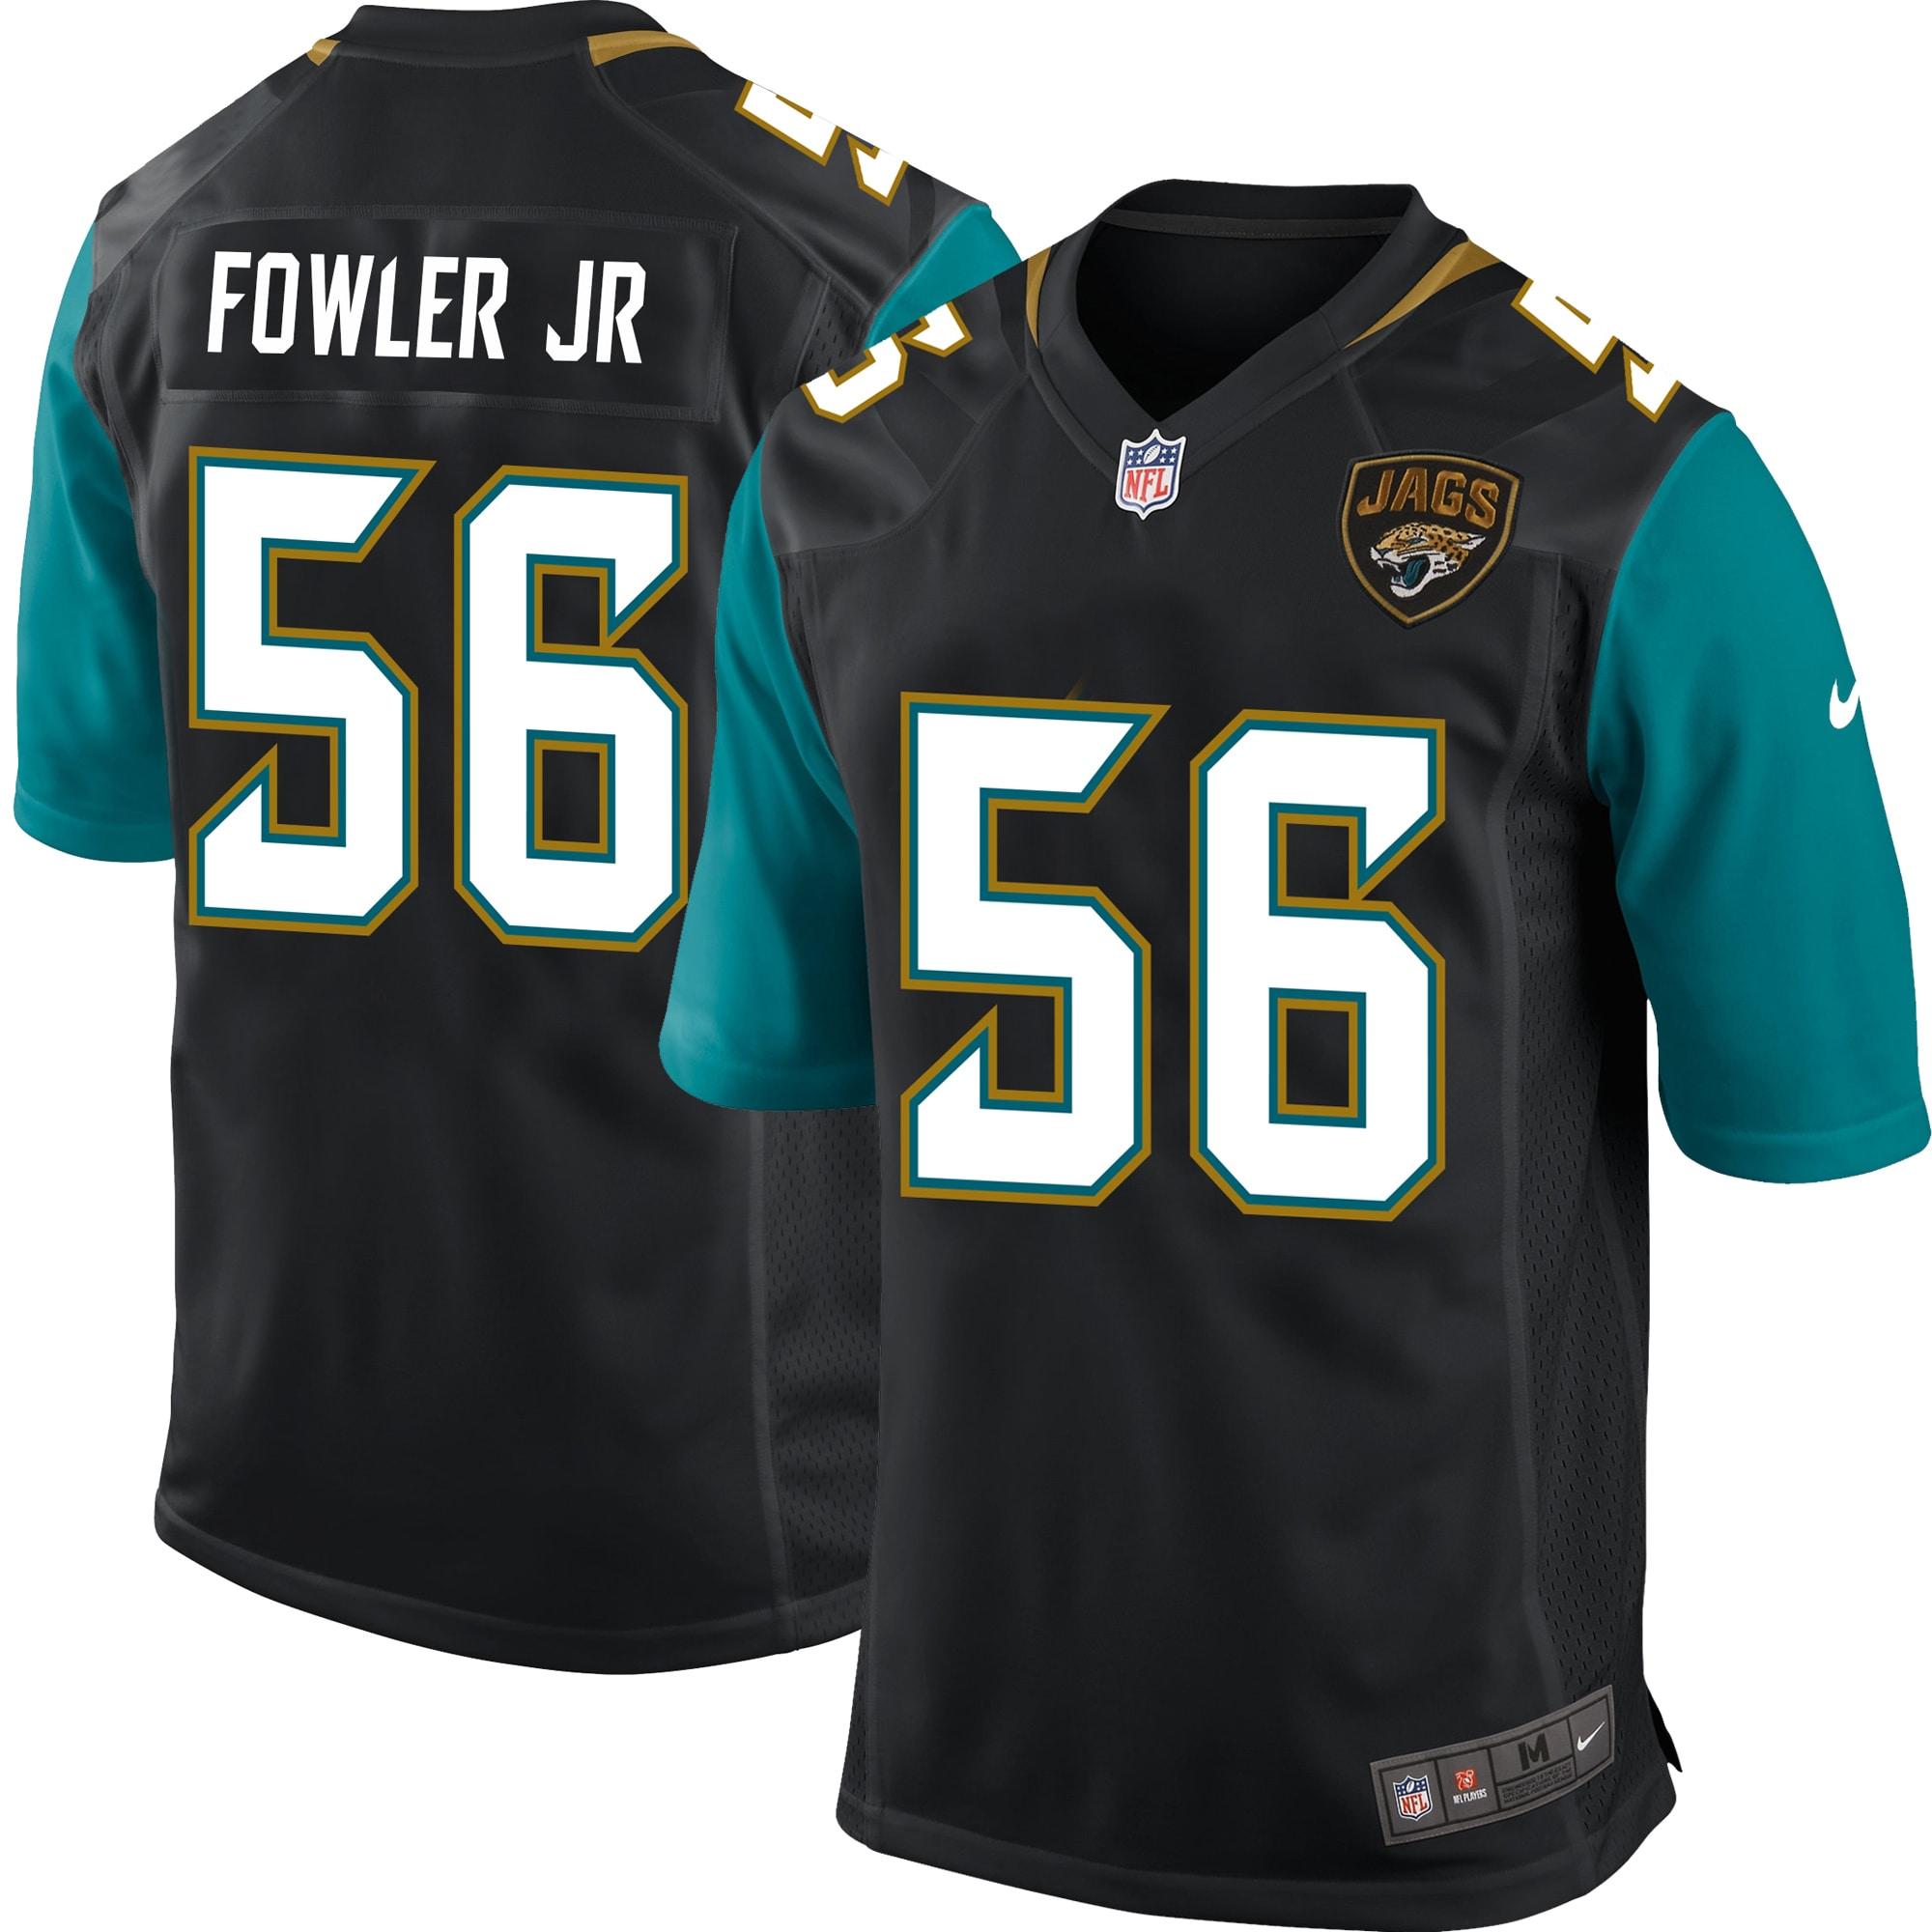 Dante Fowler Jr Jacksonville Jaguars Nike Youth 2015 Game Jersey - Black